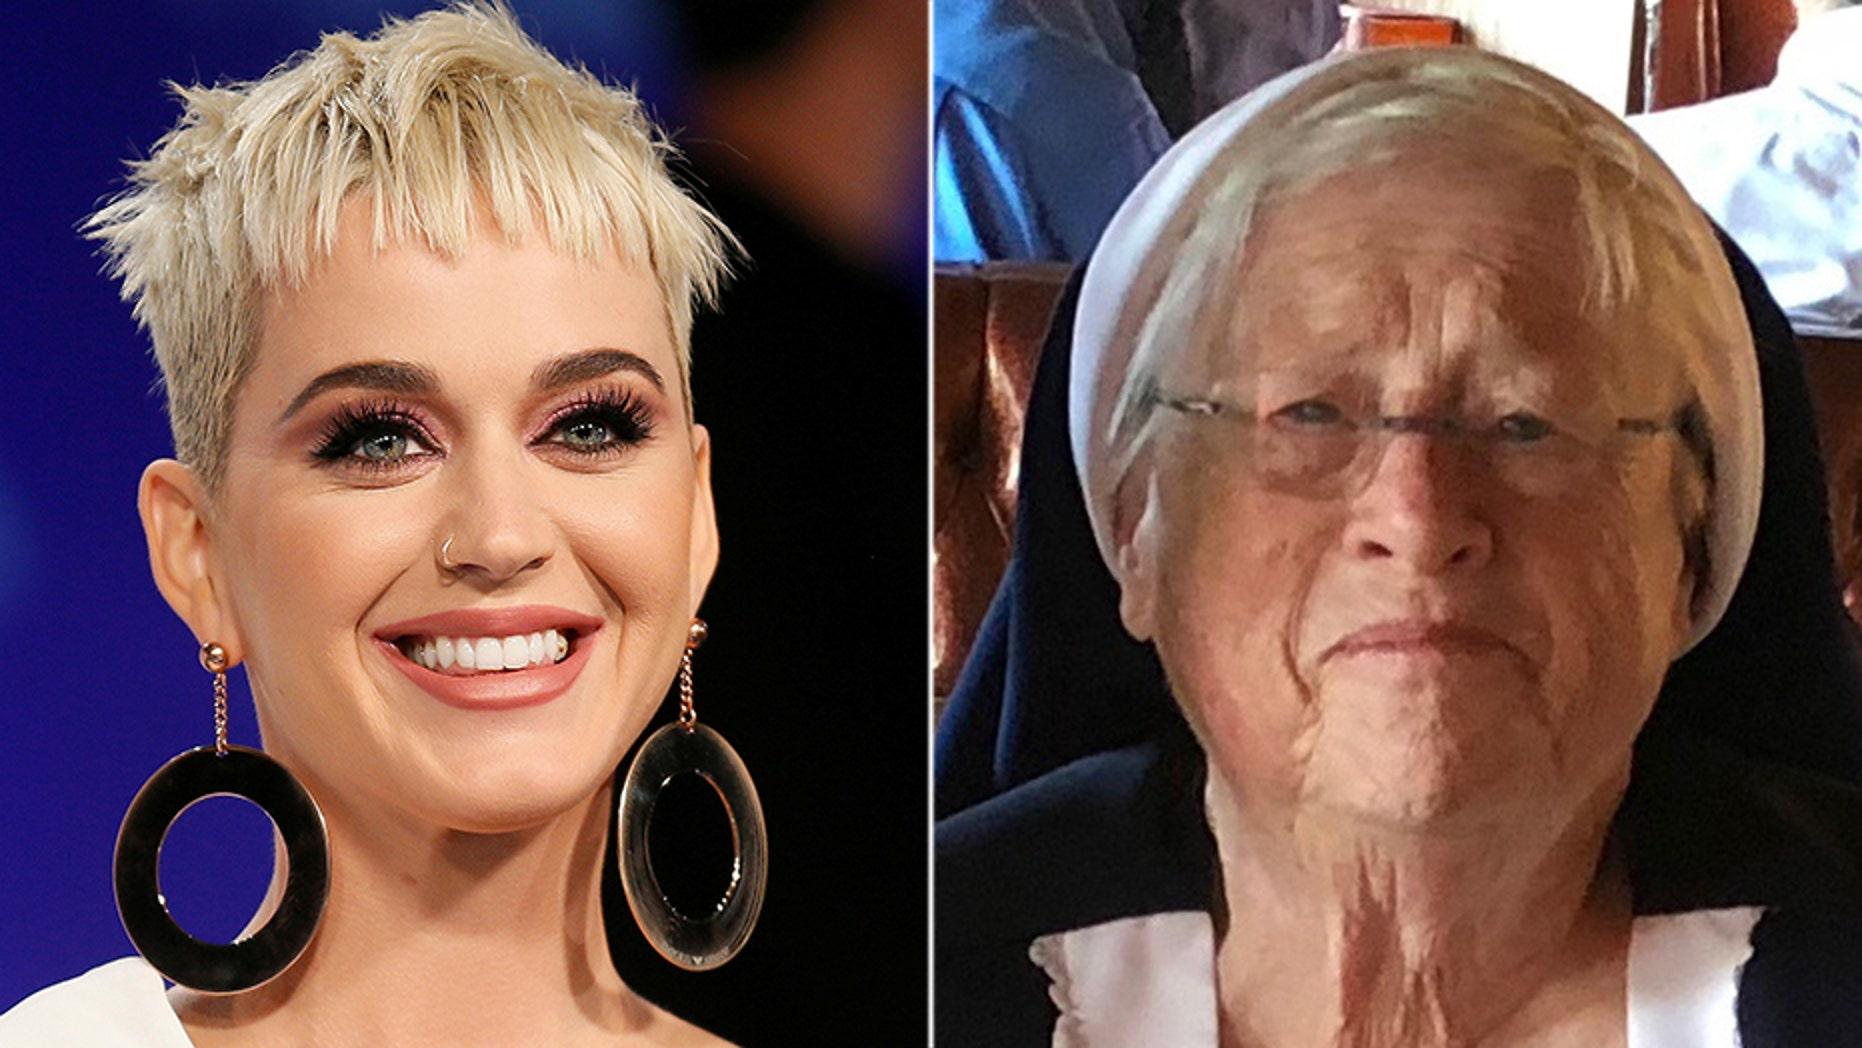 A legal battle with singer Katy Perry has left Sister Rita Callanan broke, says the nun.